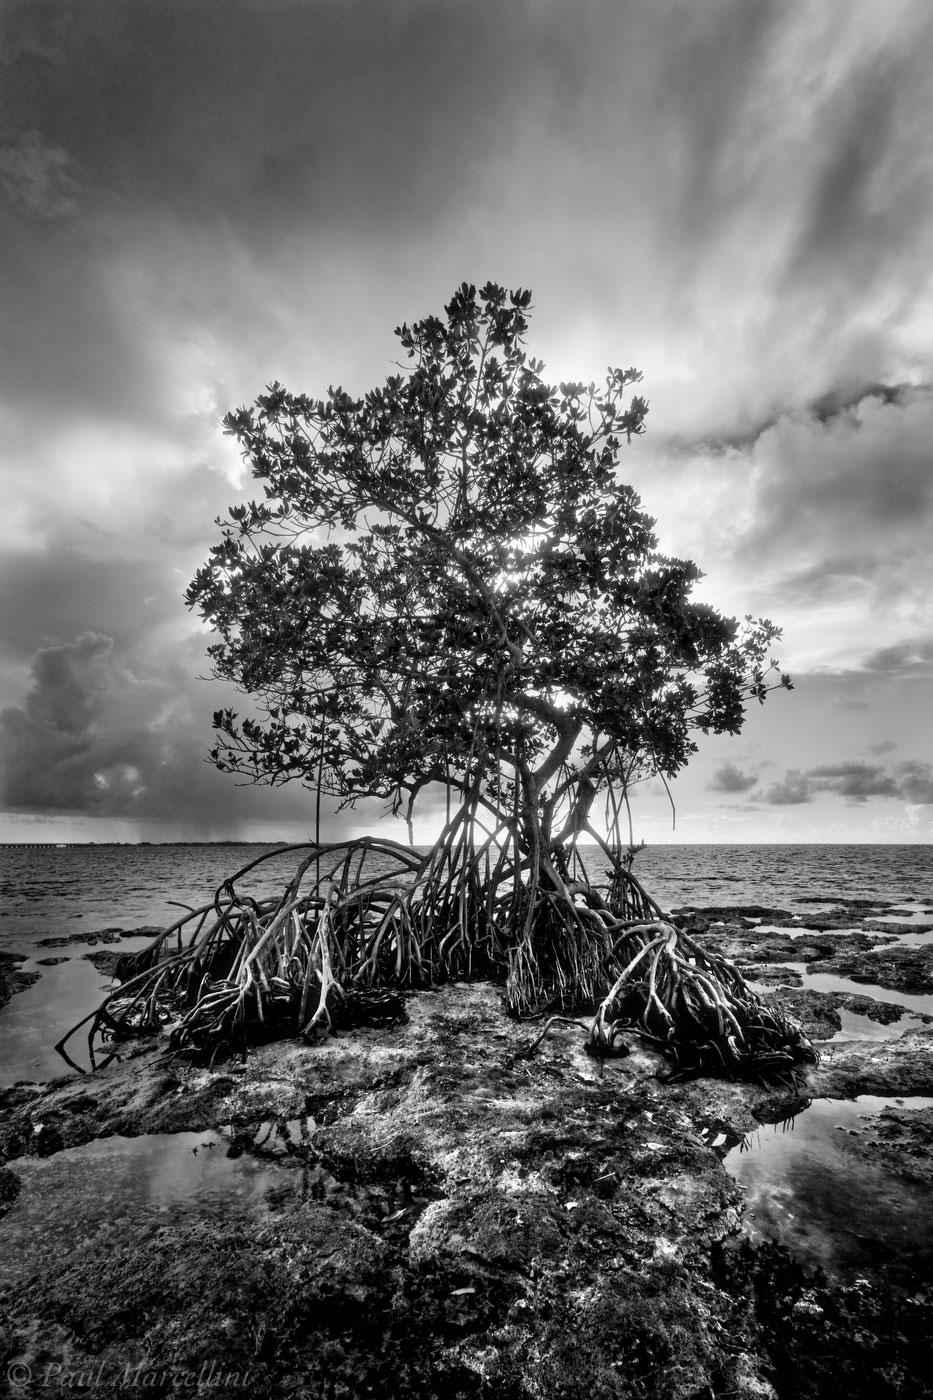 storm, big pine key, florida, mangrove, keys, florida keys, south florida, nature, photography, , photo